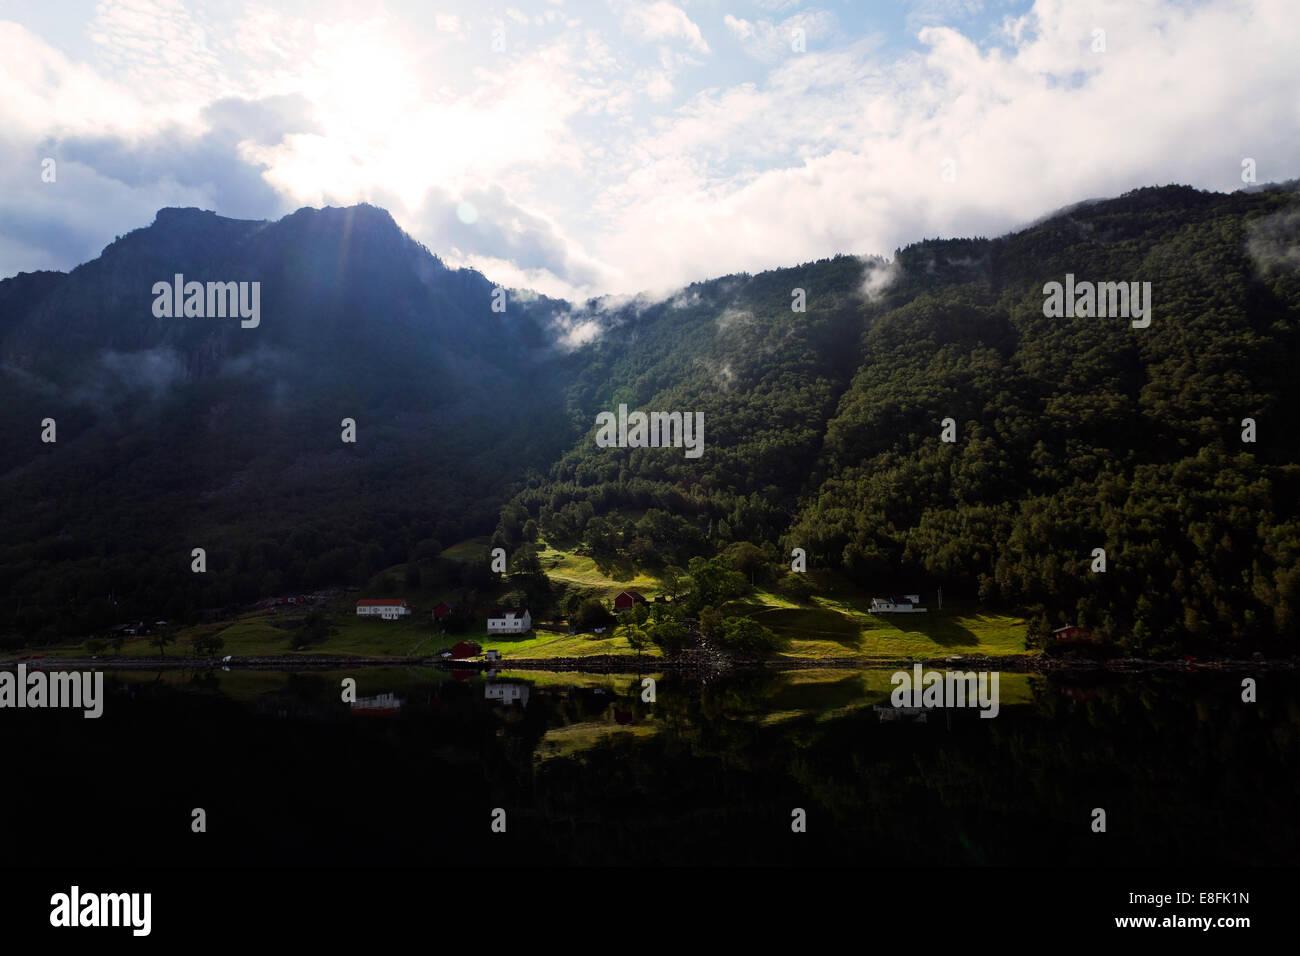 Summersun shining on houses - Stock Image